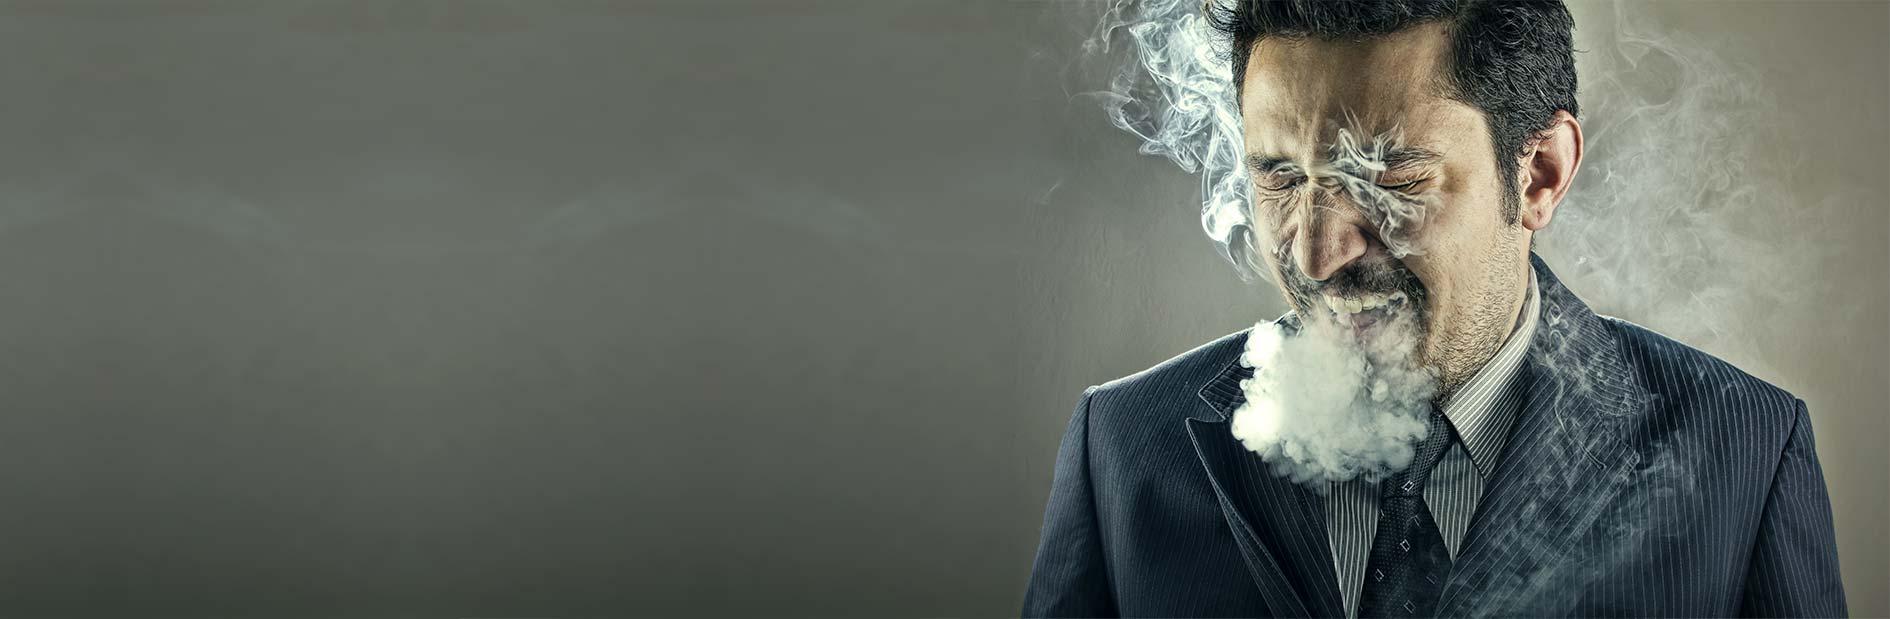 Nicotine Free - funciona - ingredientes - como tomar